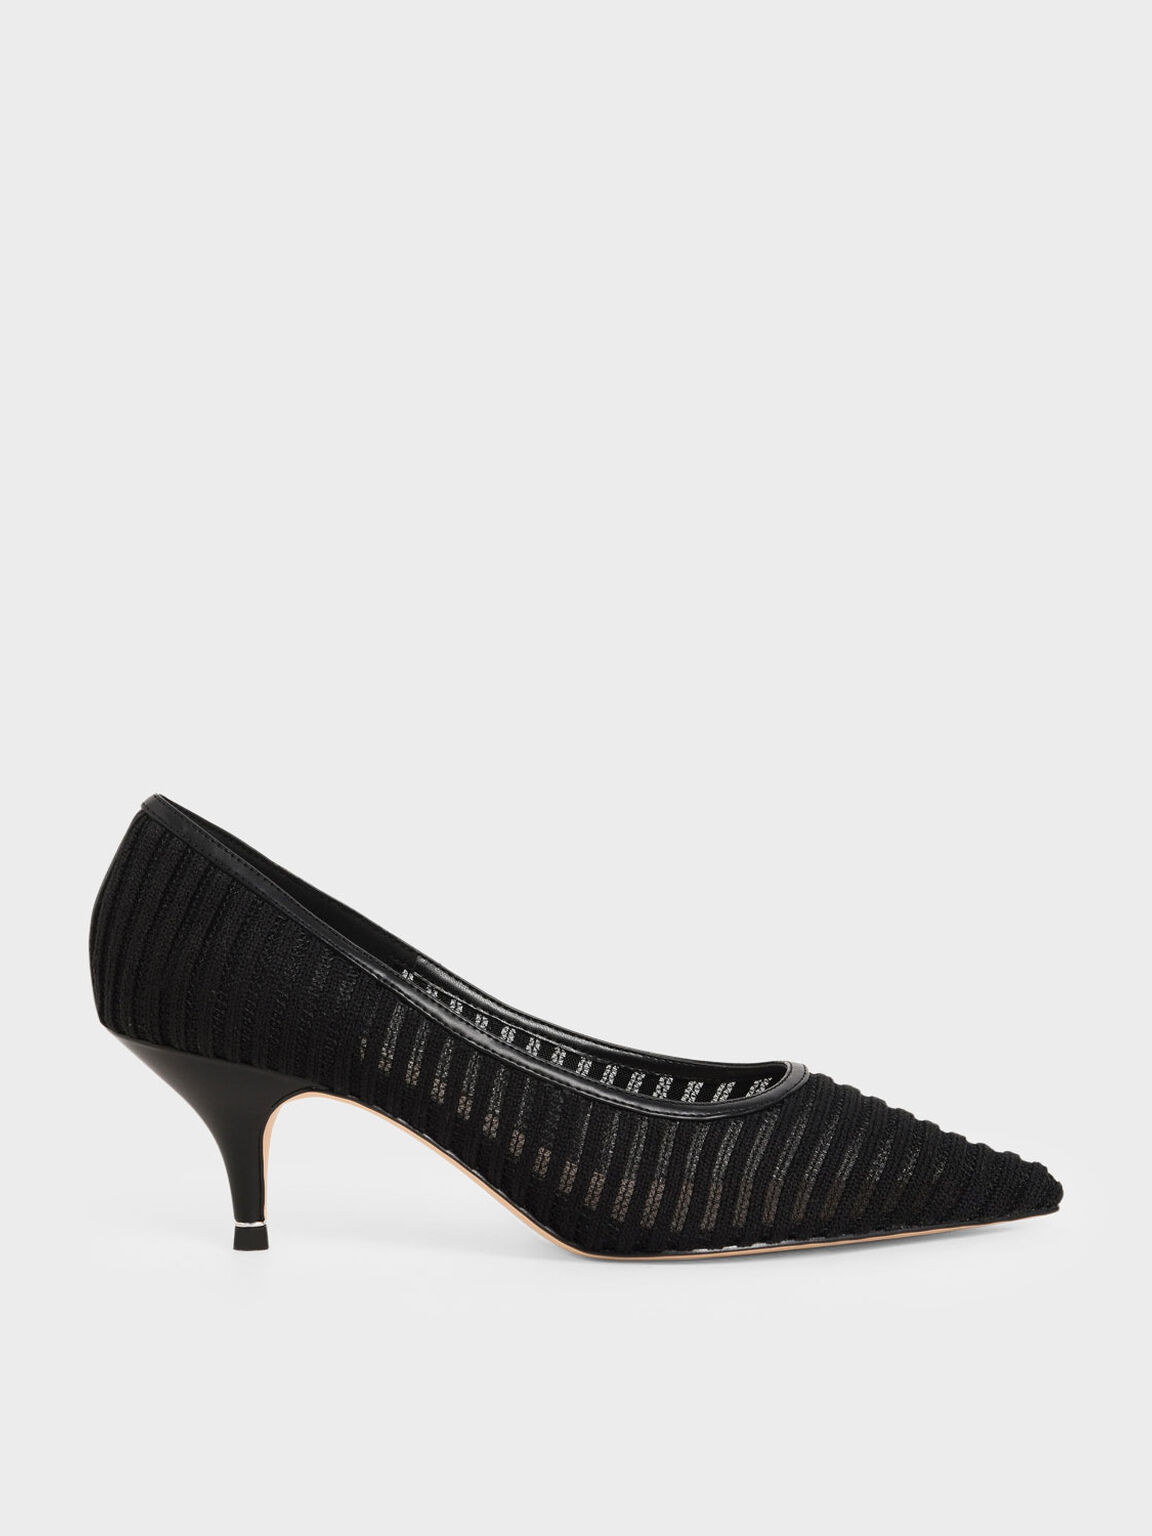 Mesh Pointed Toe Pumps, Black, hi-res